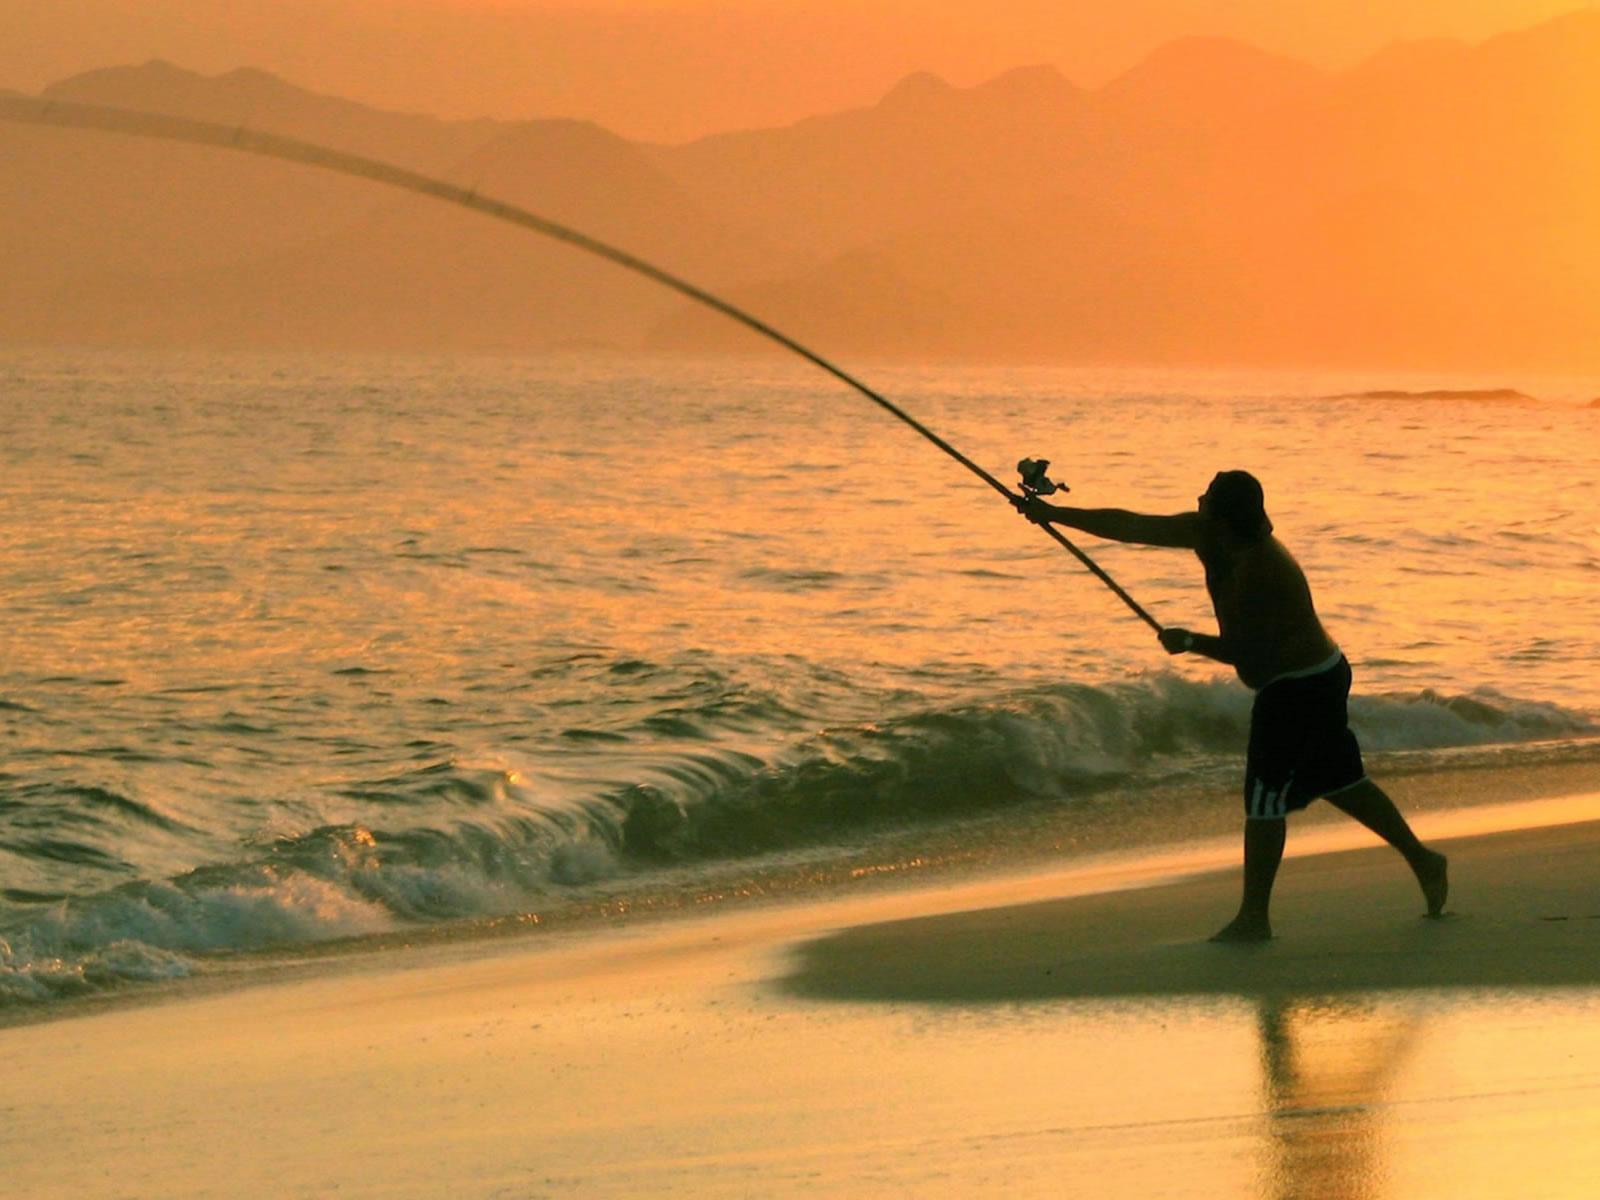 1600x1200 Fishing in the sea desktop PC and Mac wallpaper 1600x1200